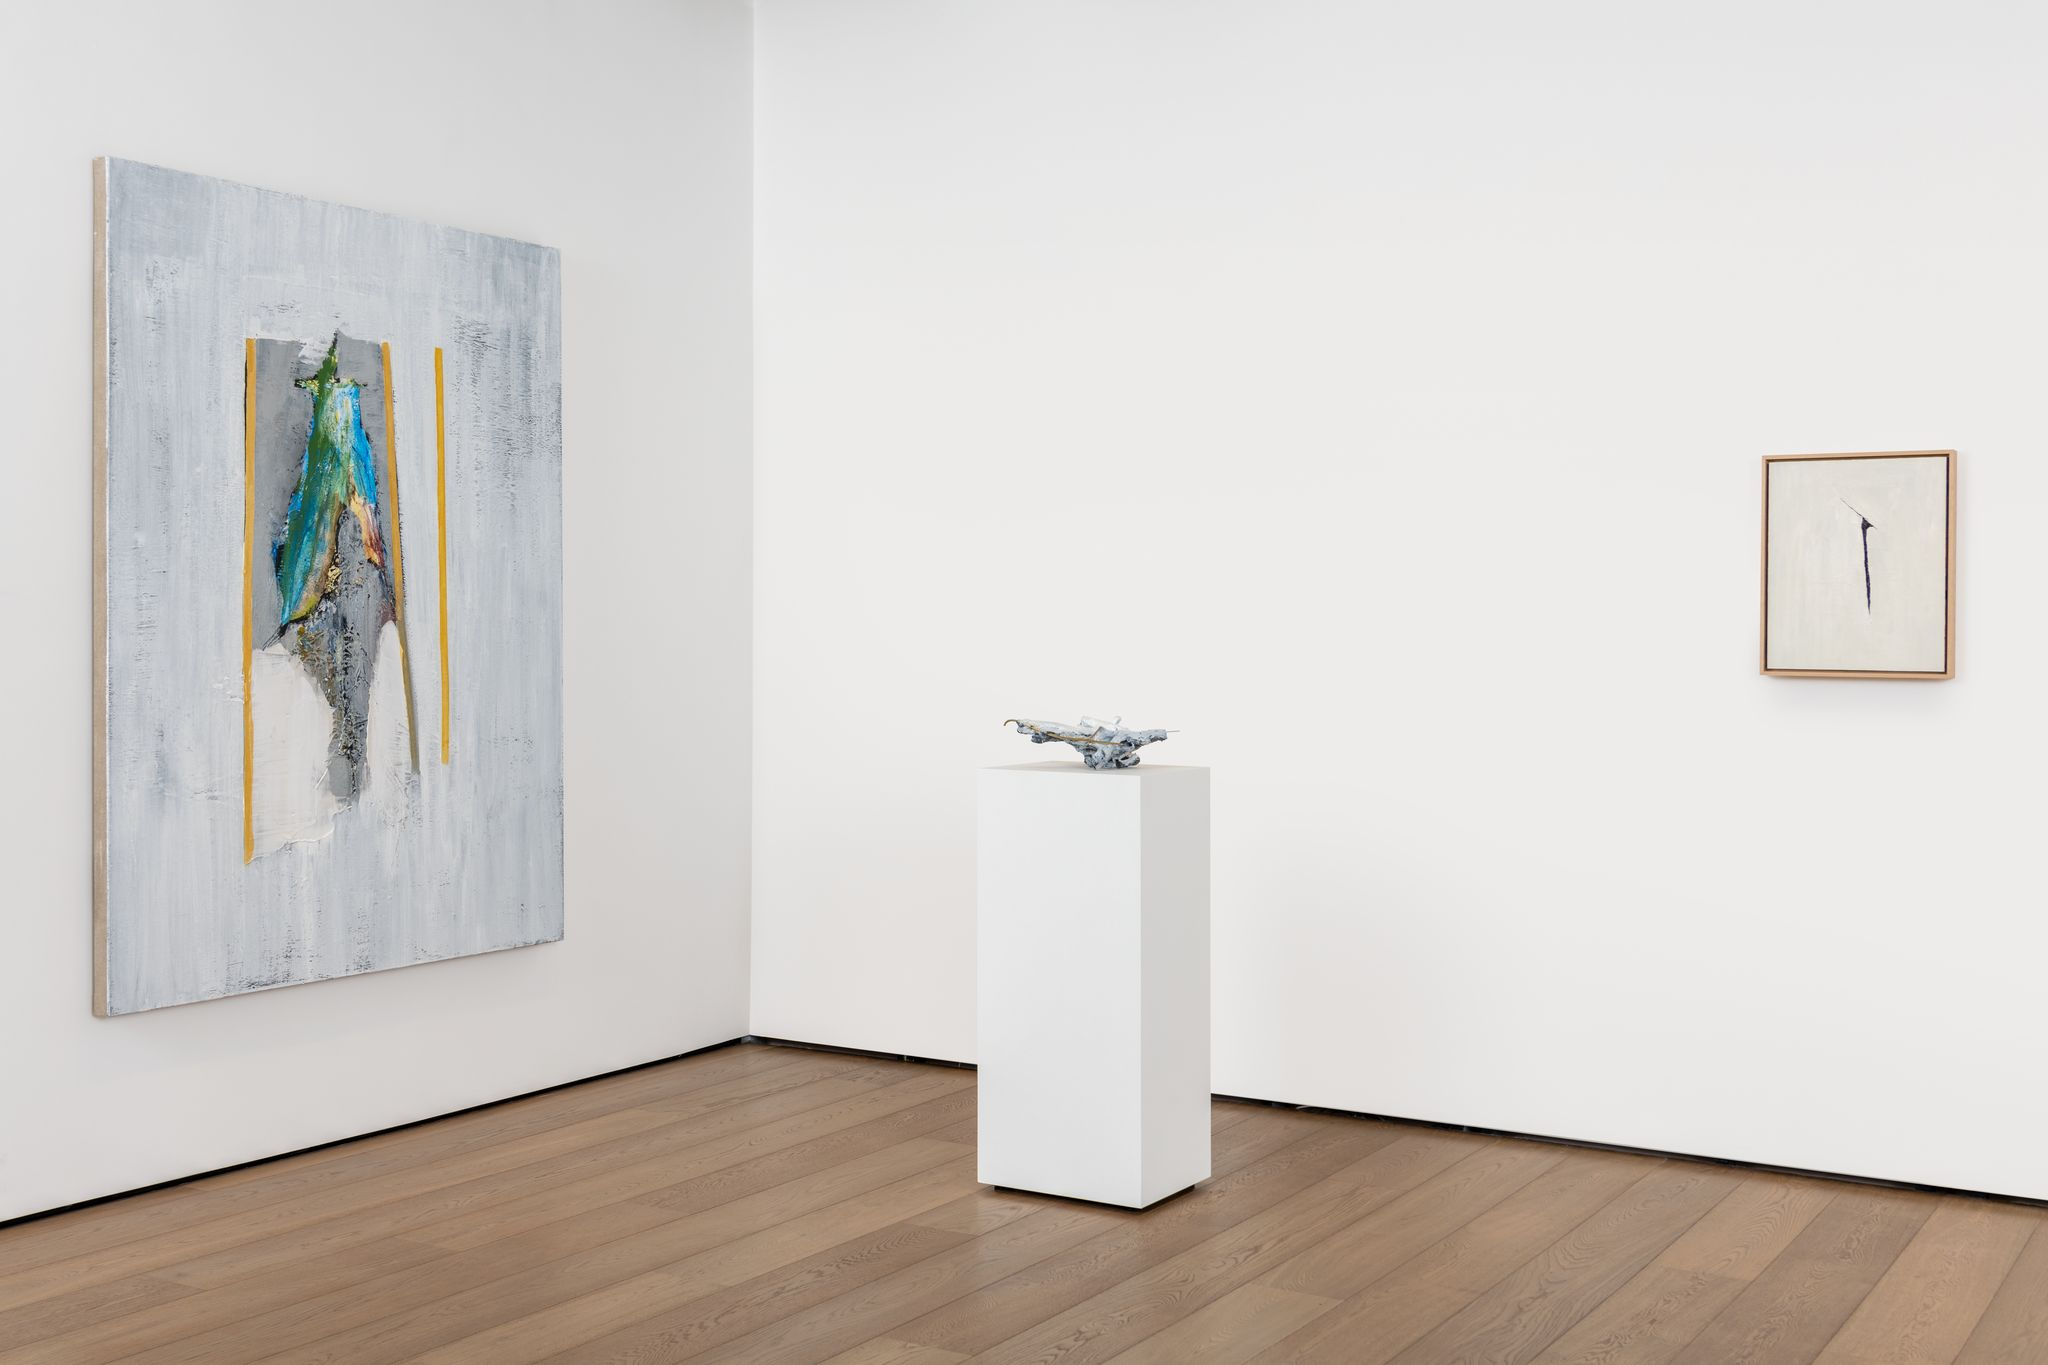 Installation View, Erik Lindman, Parsifal, November 27, 2019 — January 18, 2020, London